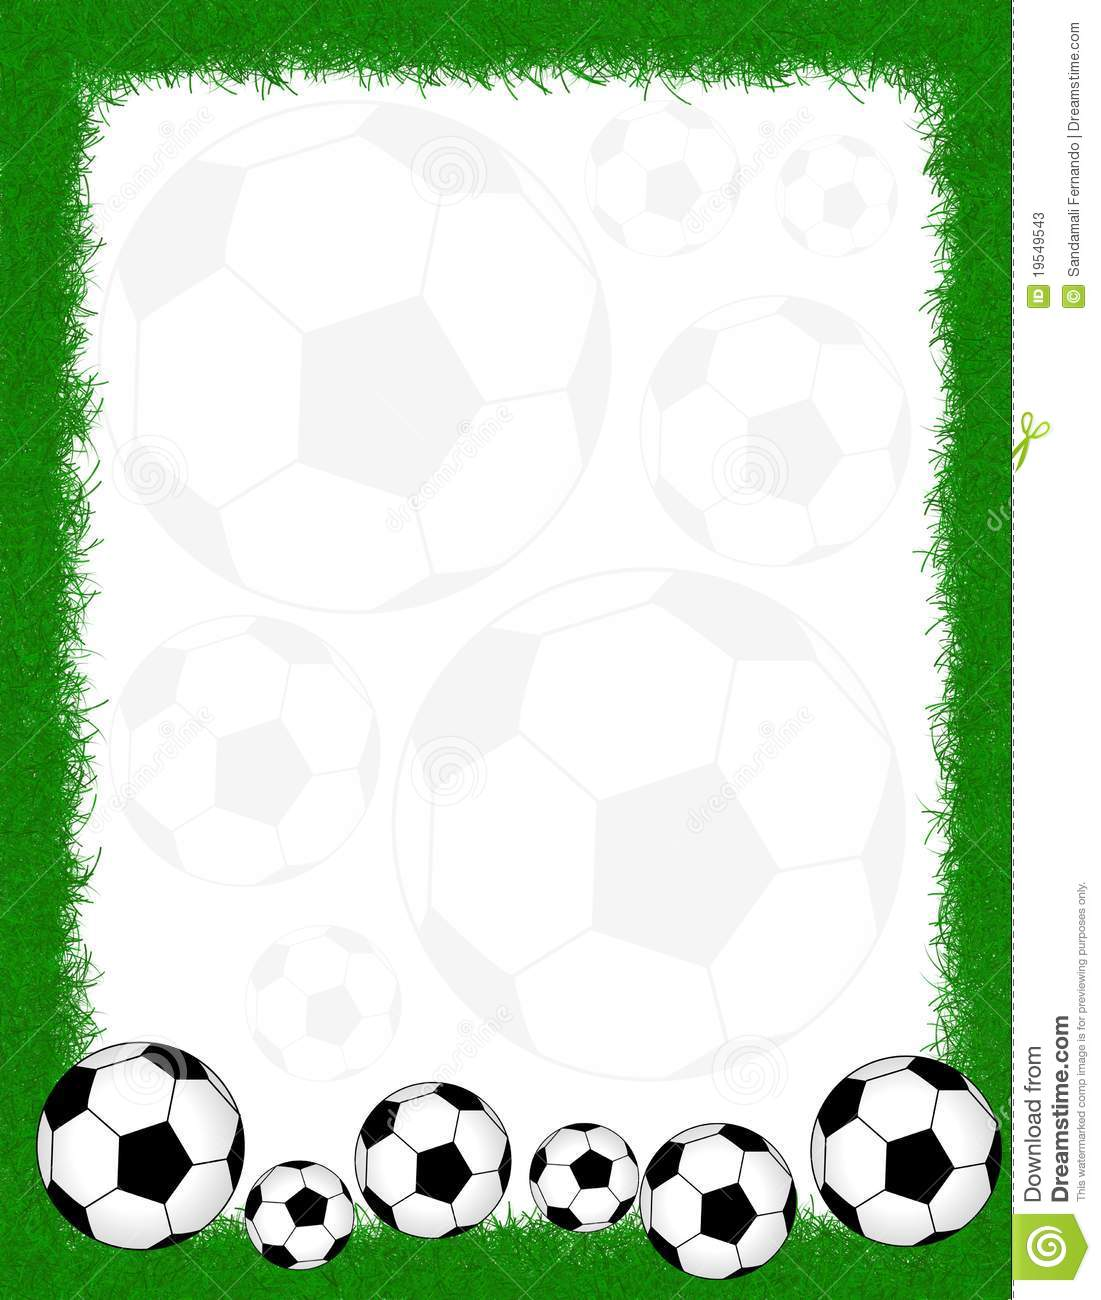 Football clipart frame Panda Football football%20borders%20and%20frames Clipart Borders